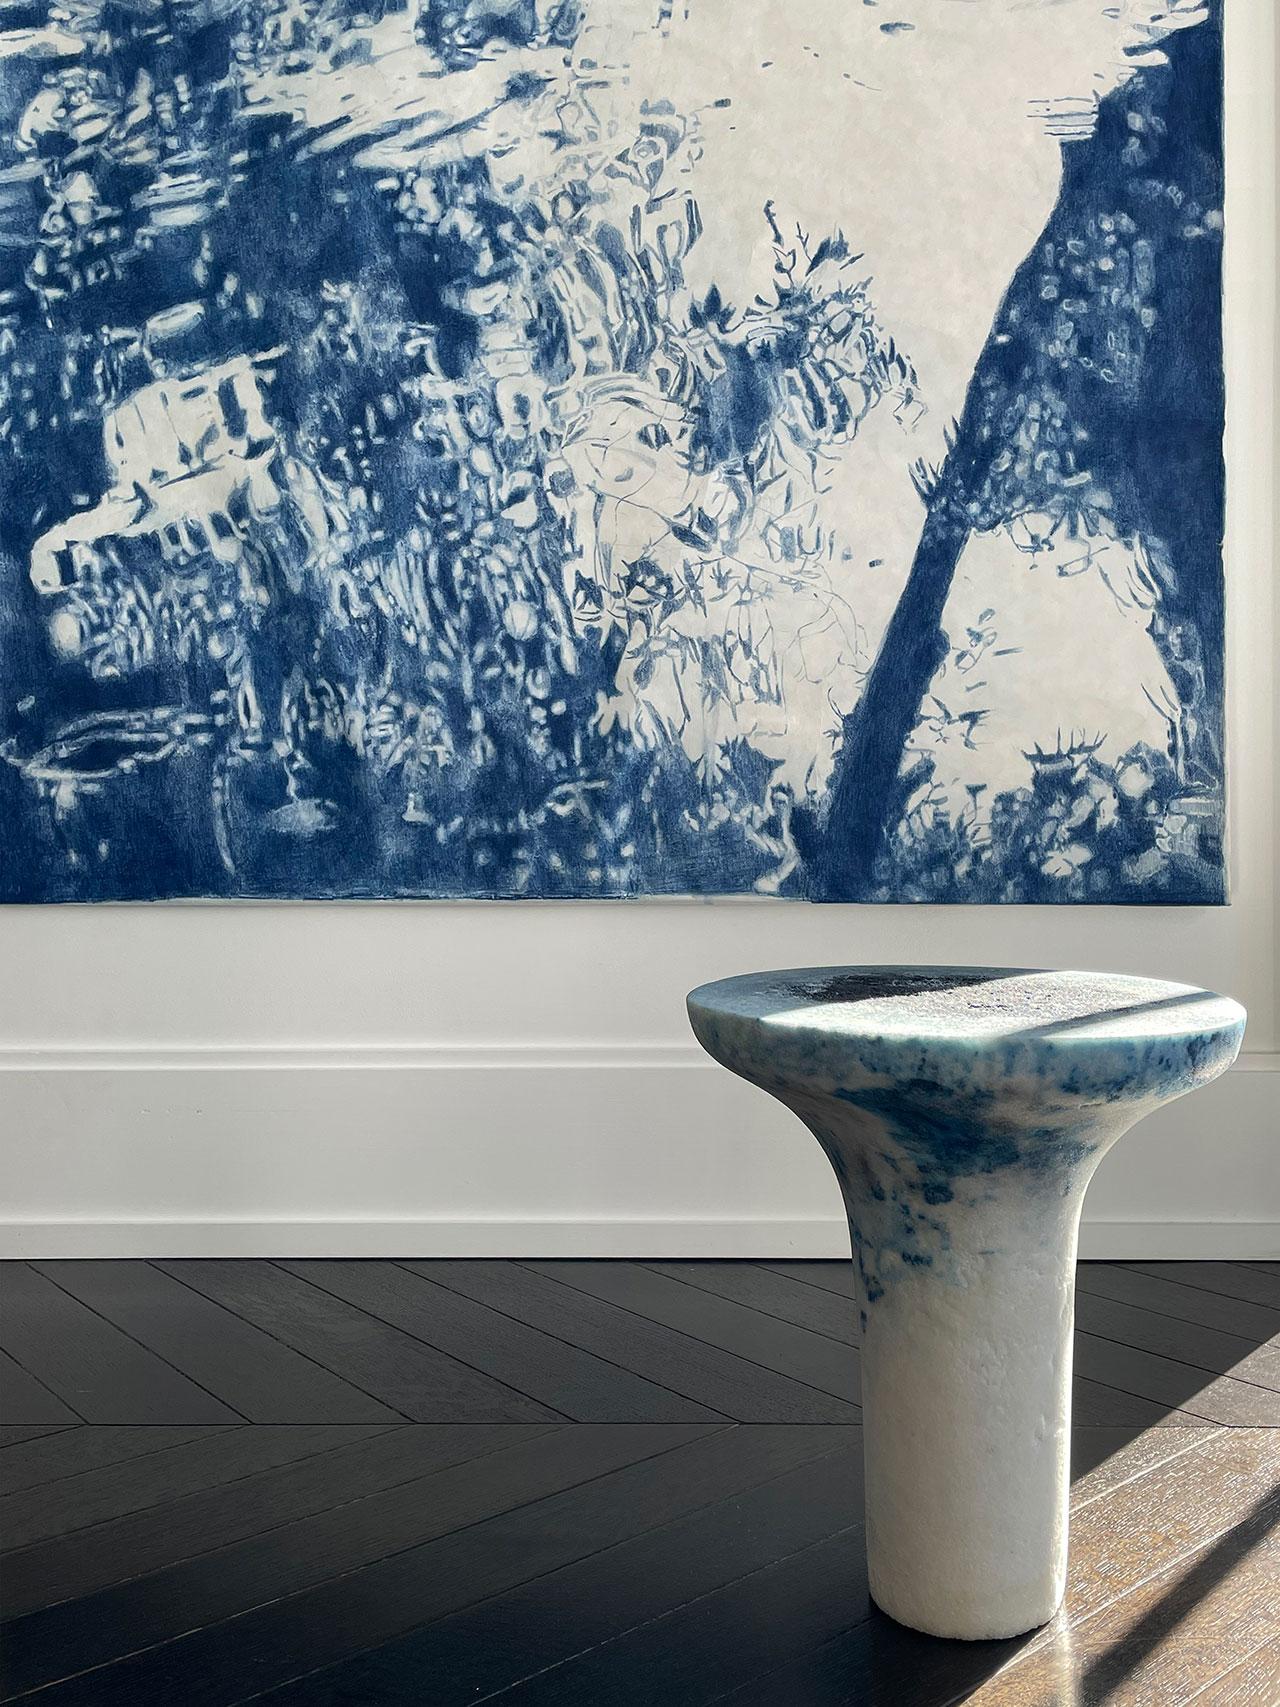 Galerie Philia at Walker Tower, Chelsea, New York. Courtesy of Galerie Philia. Featured: Flora Temnouche, Portraits de Rousseau. Pencil on japanese paper. 150 × 200 cm. Roxane Lahidji,Salt Gueridon, 2019.Marbled Salt.